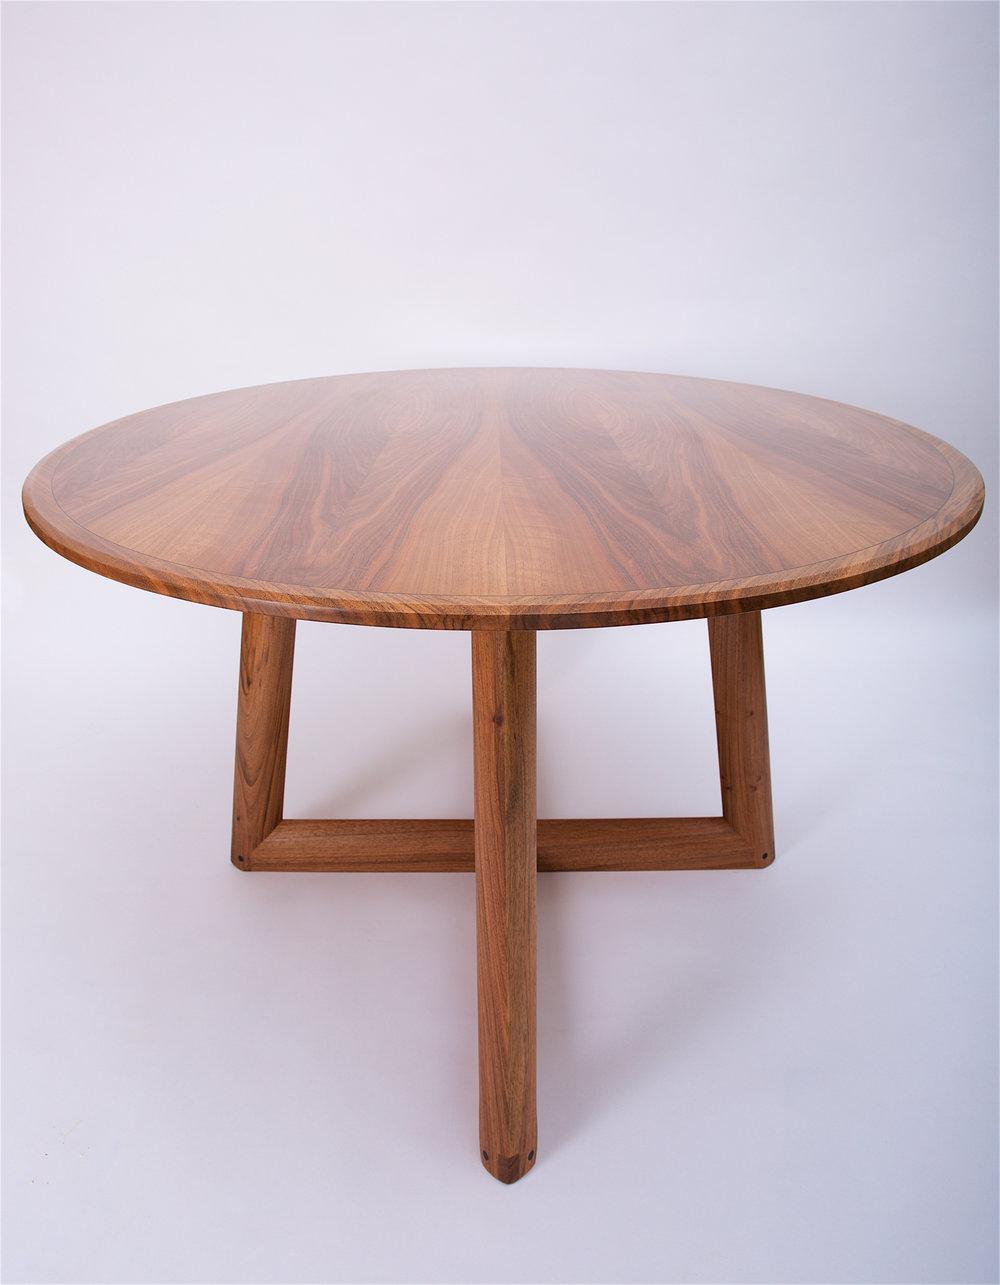 Petrel furniture bespoke english walnut dining table